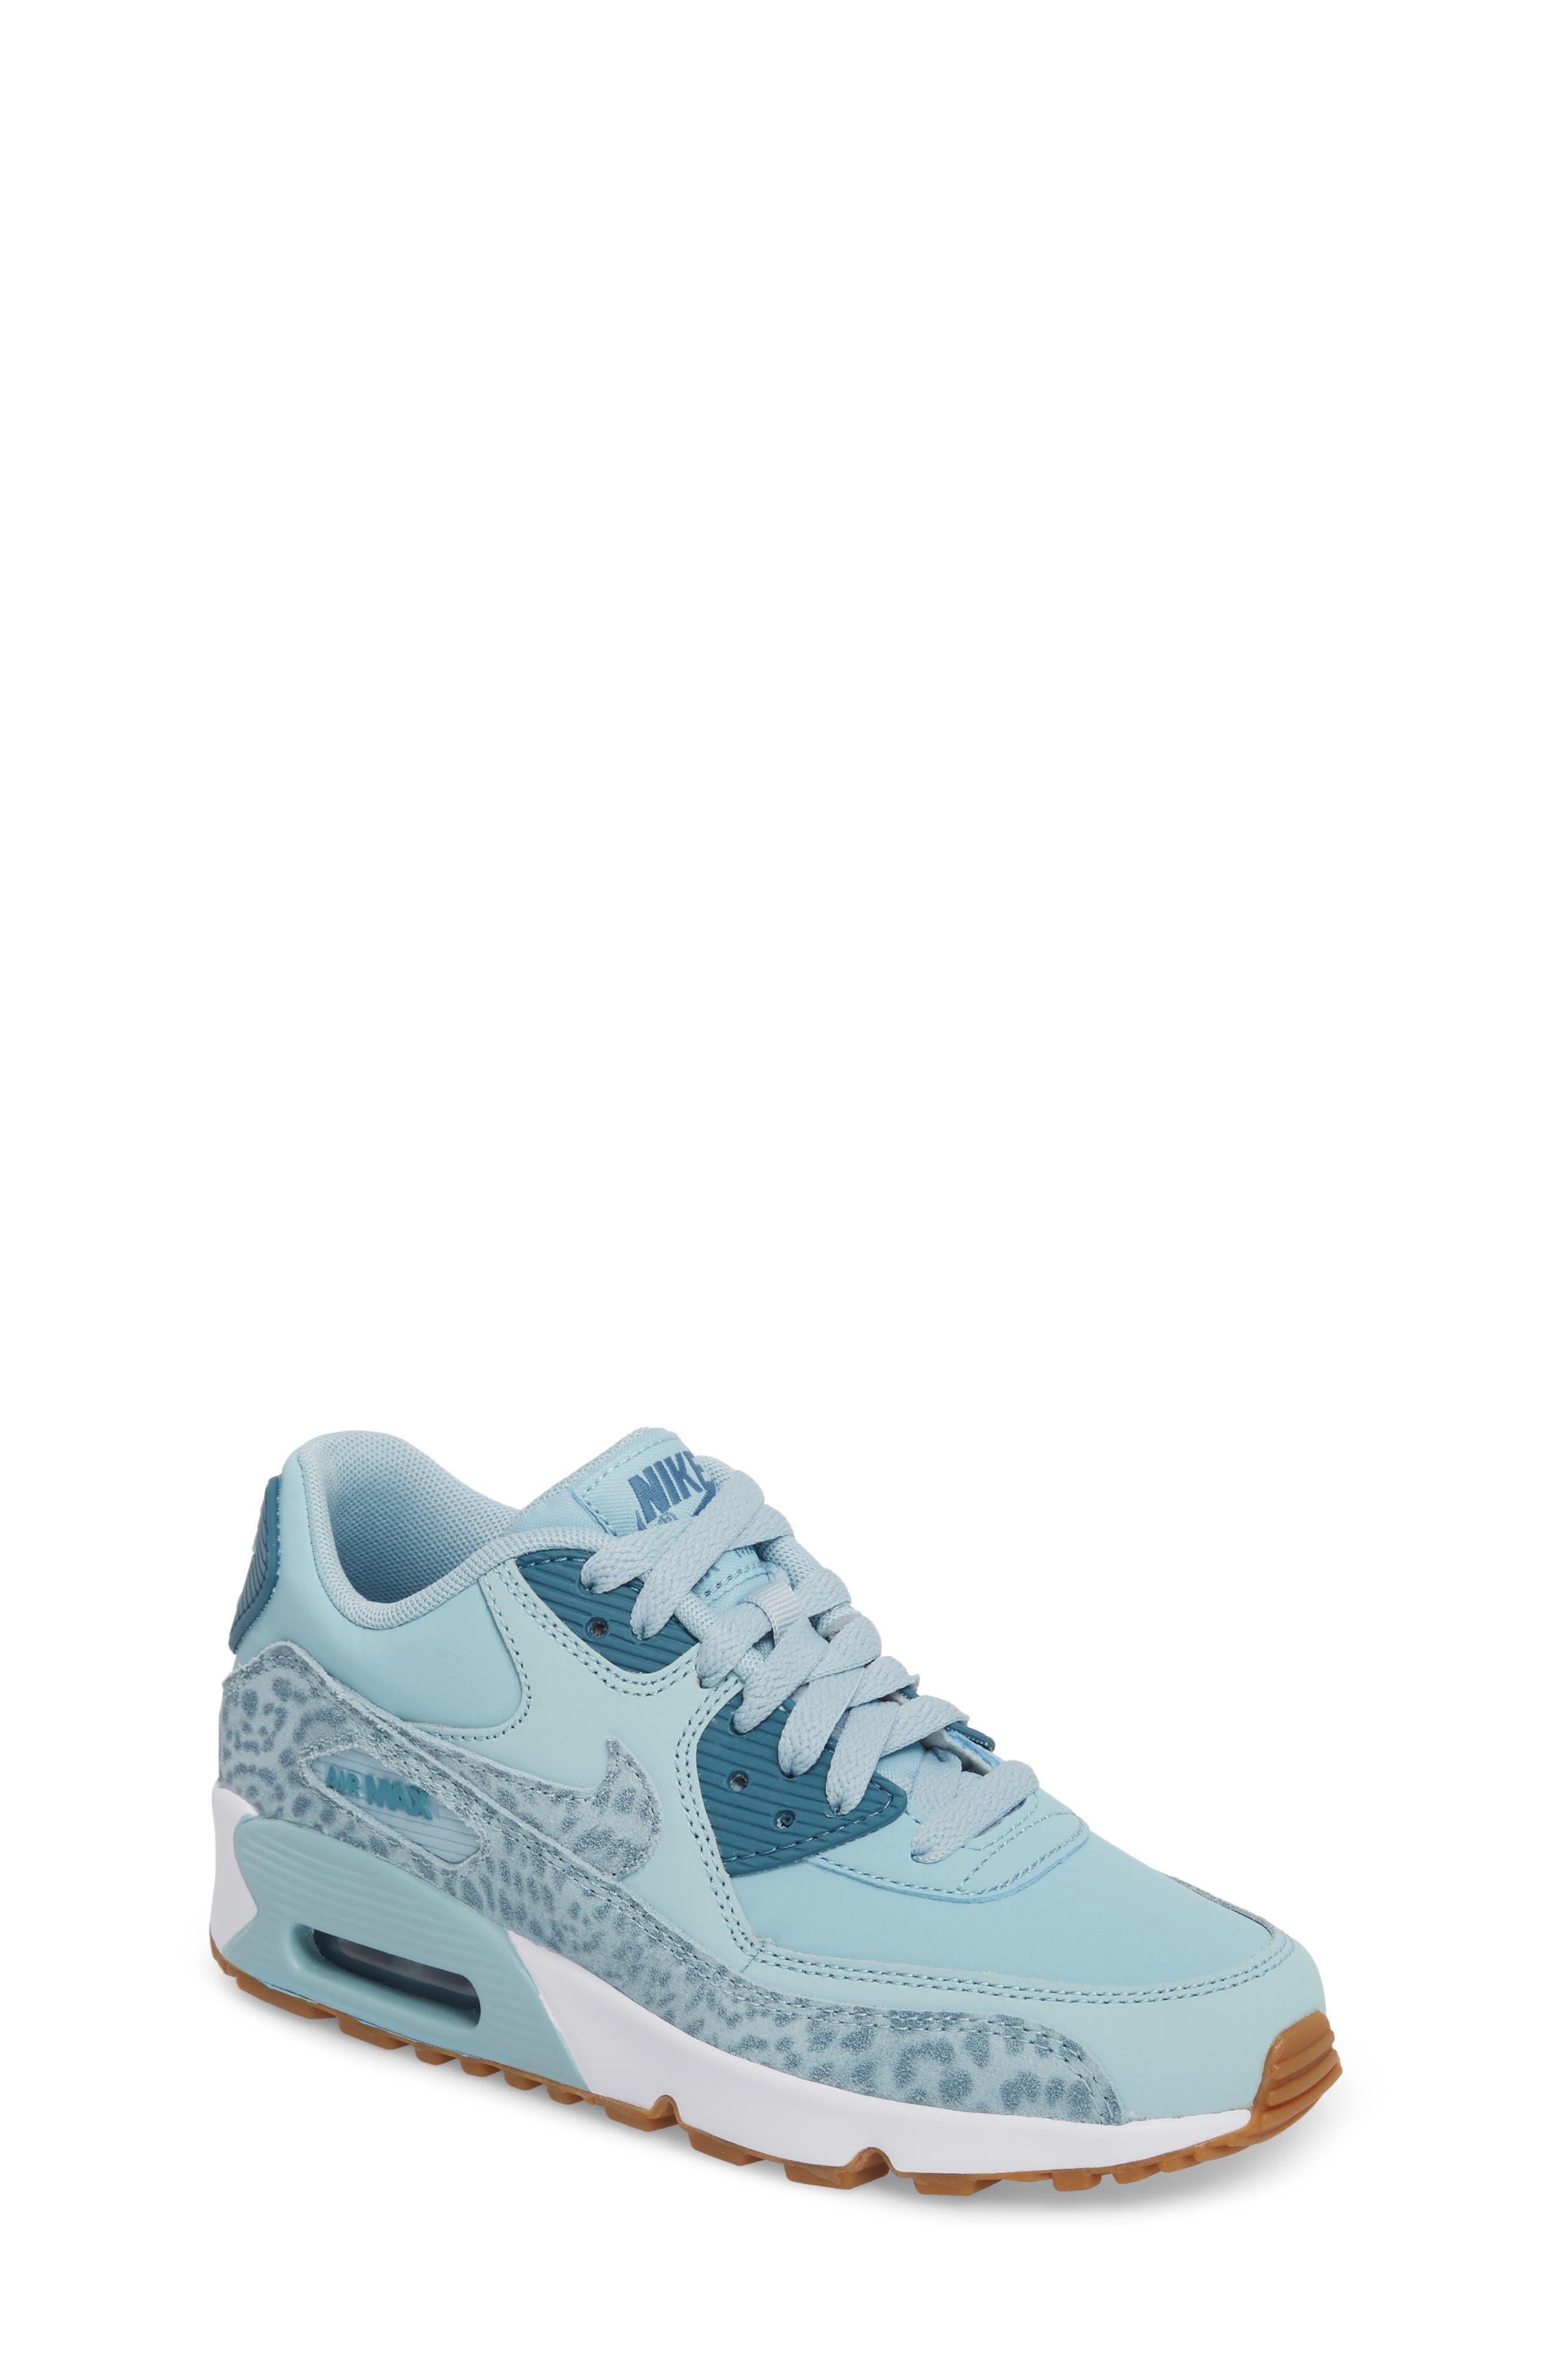 Air Max 90 Leather Sneaker,                             Main thumbnail 1, color,                             Ocean Bliss/ Noise Aqua/ White